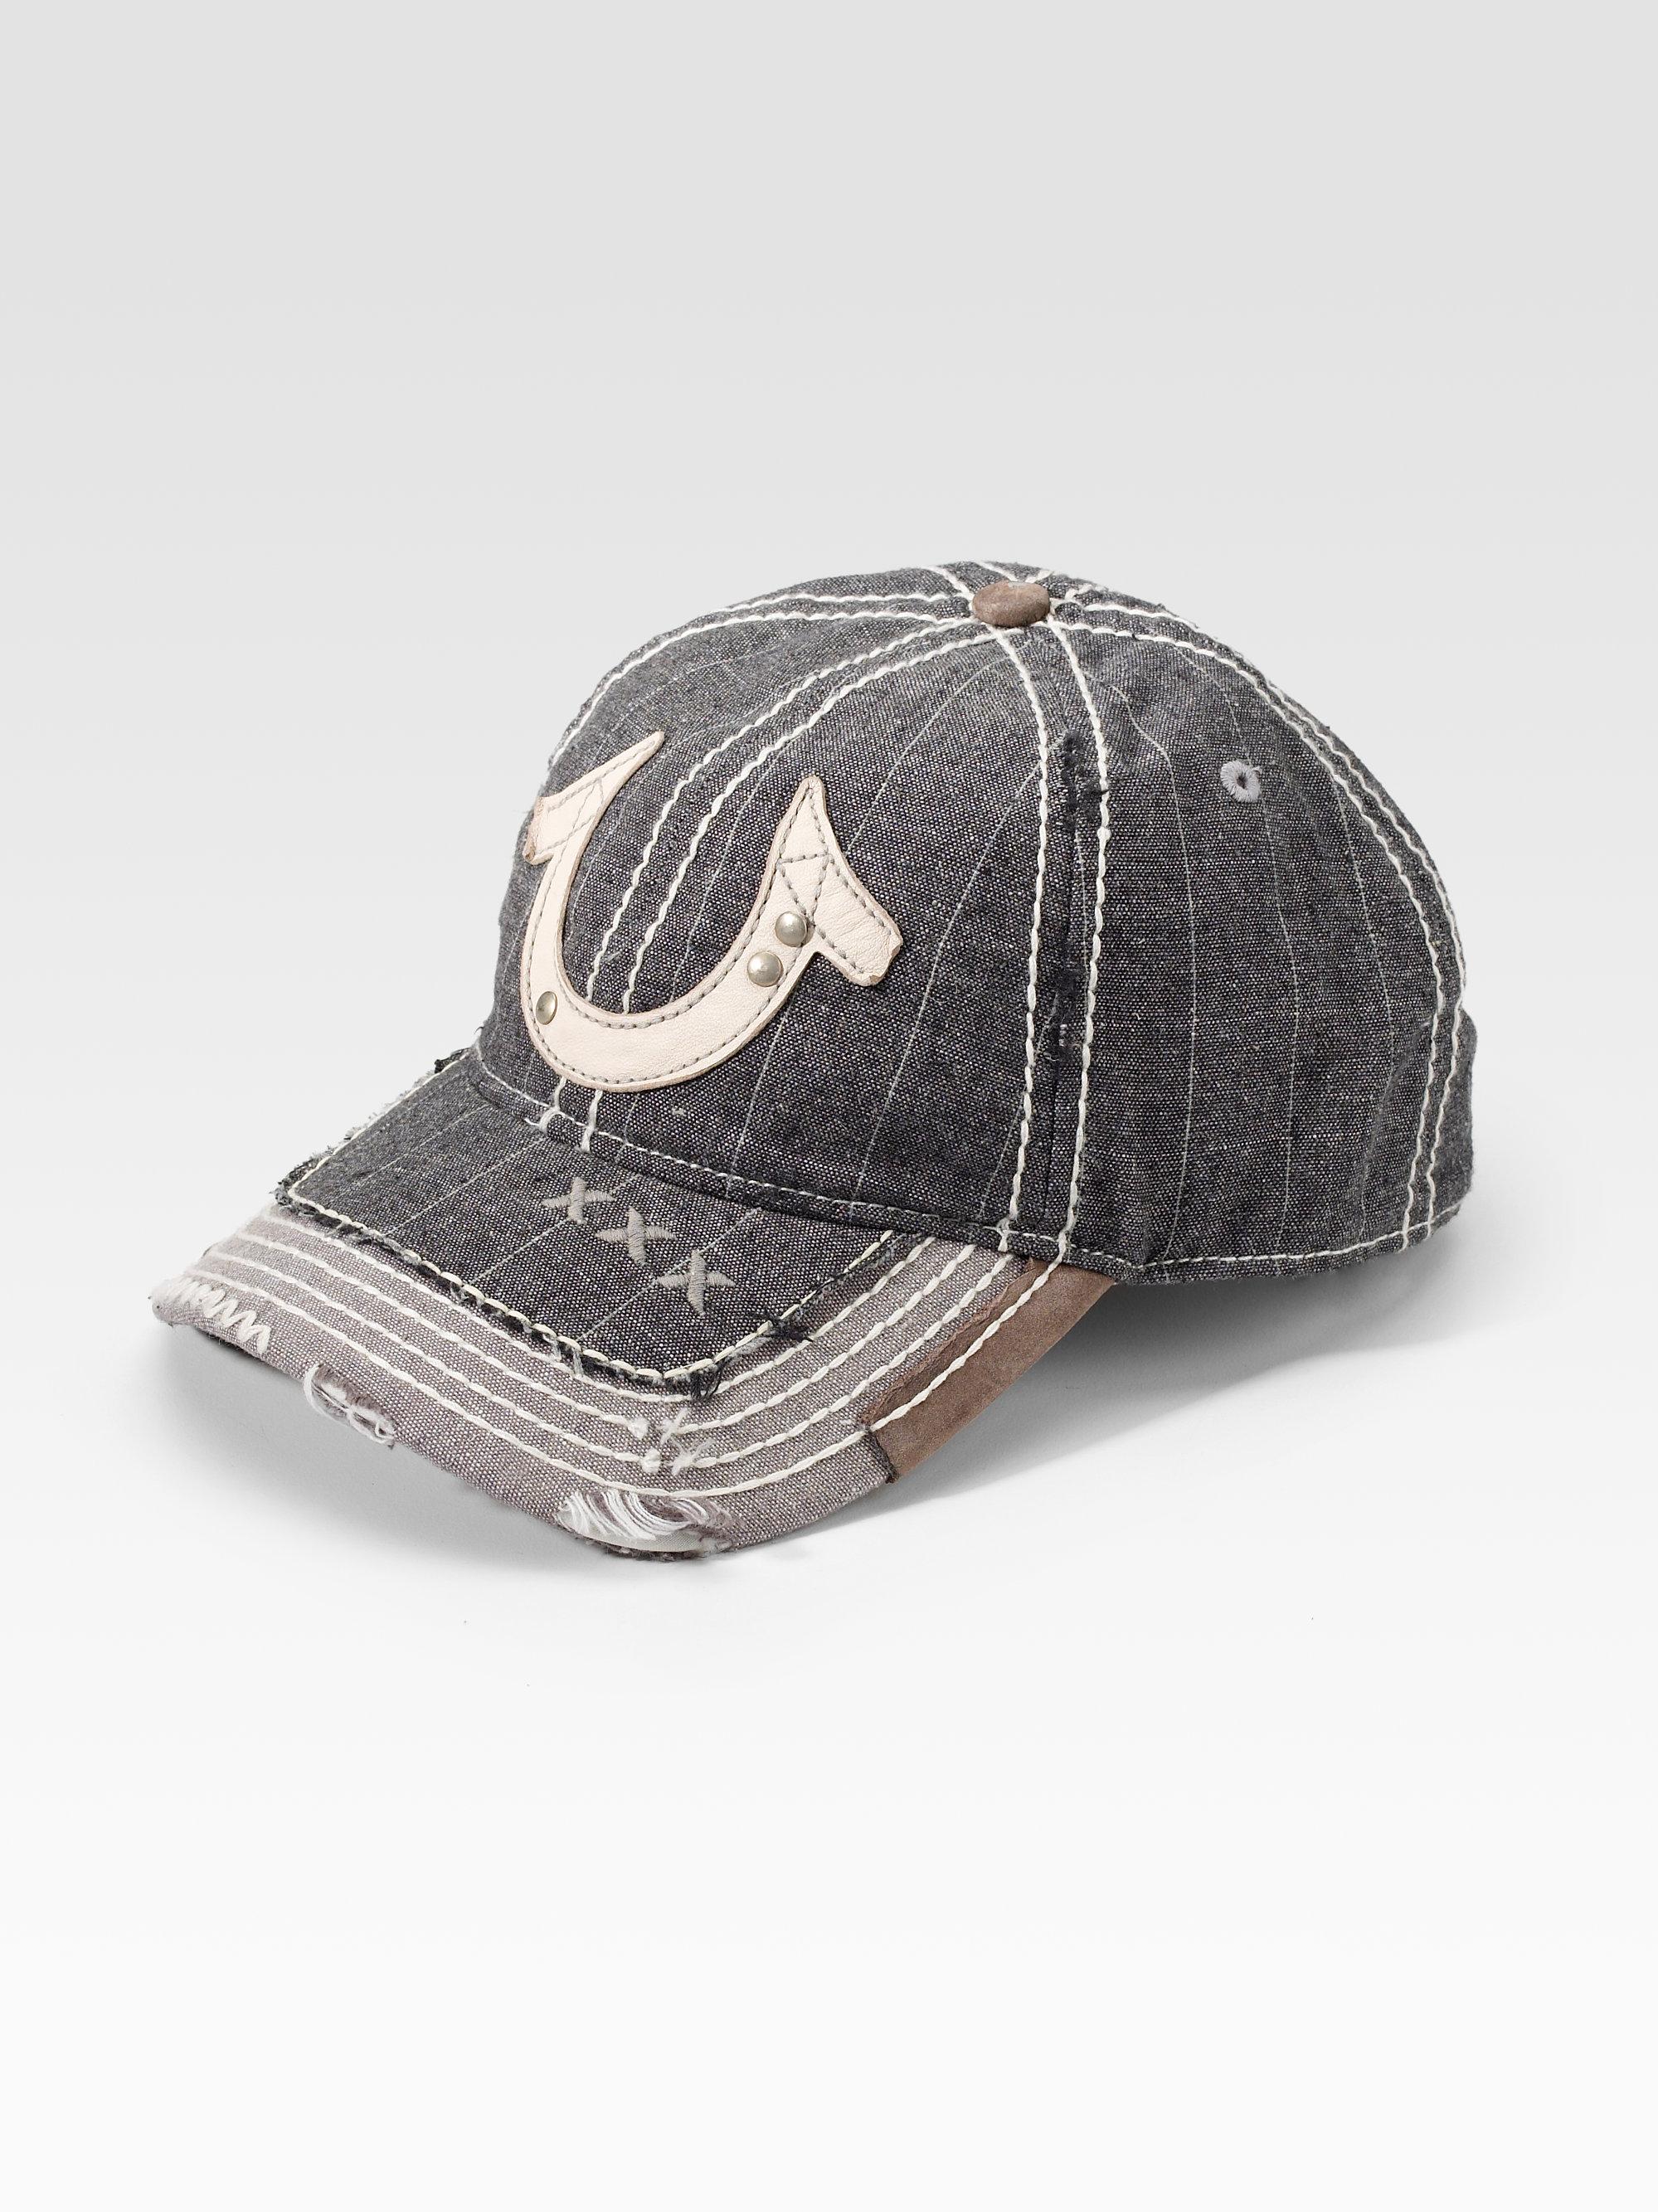 19131f871b3e89 True Religion Pinstripe Horseshoe Hat in Gray for Men - Lyst